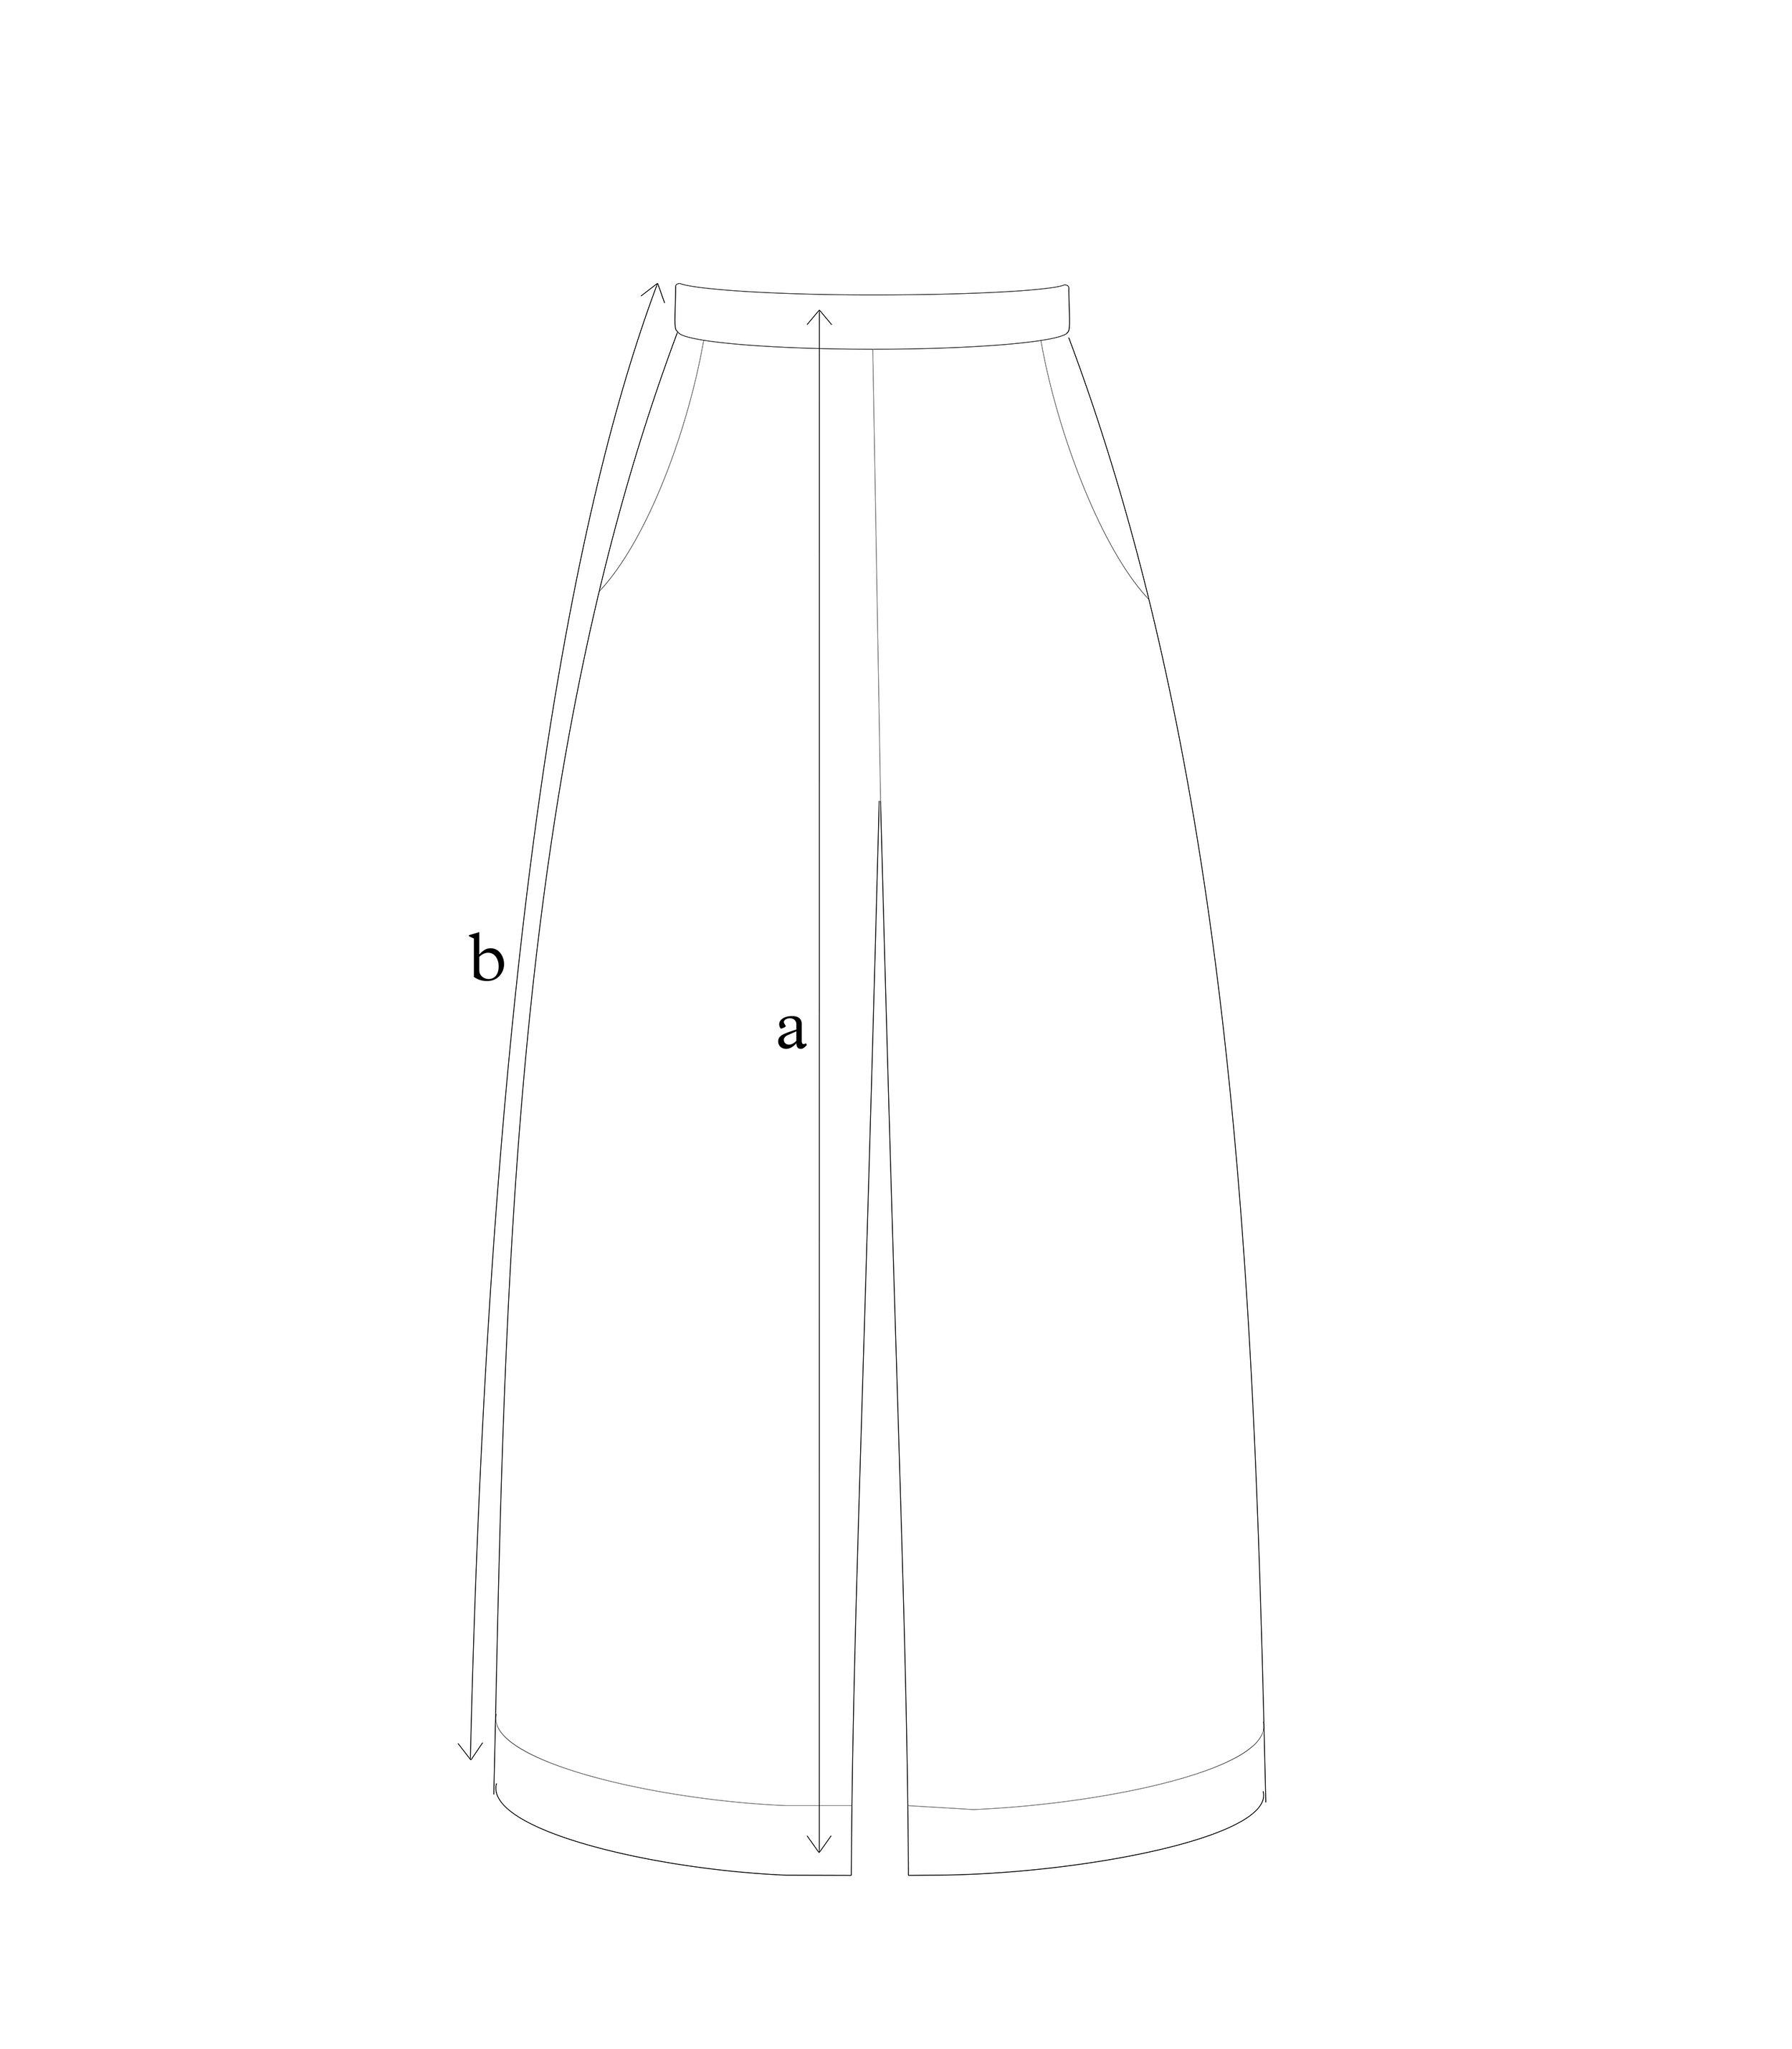 #041 trousers - line drawing.jpg